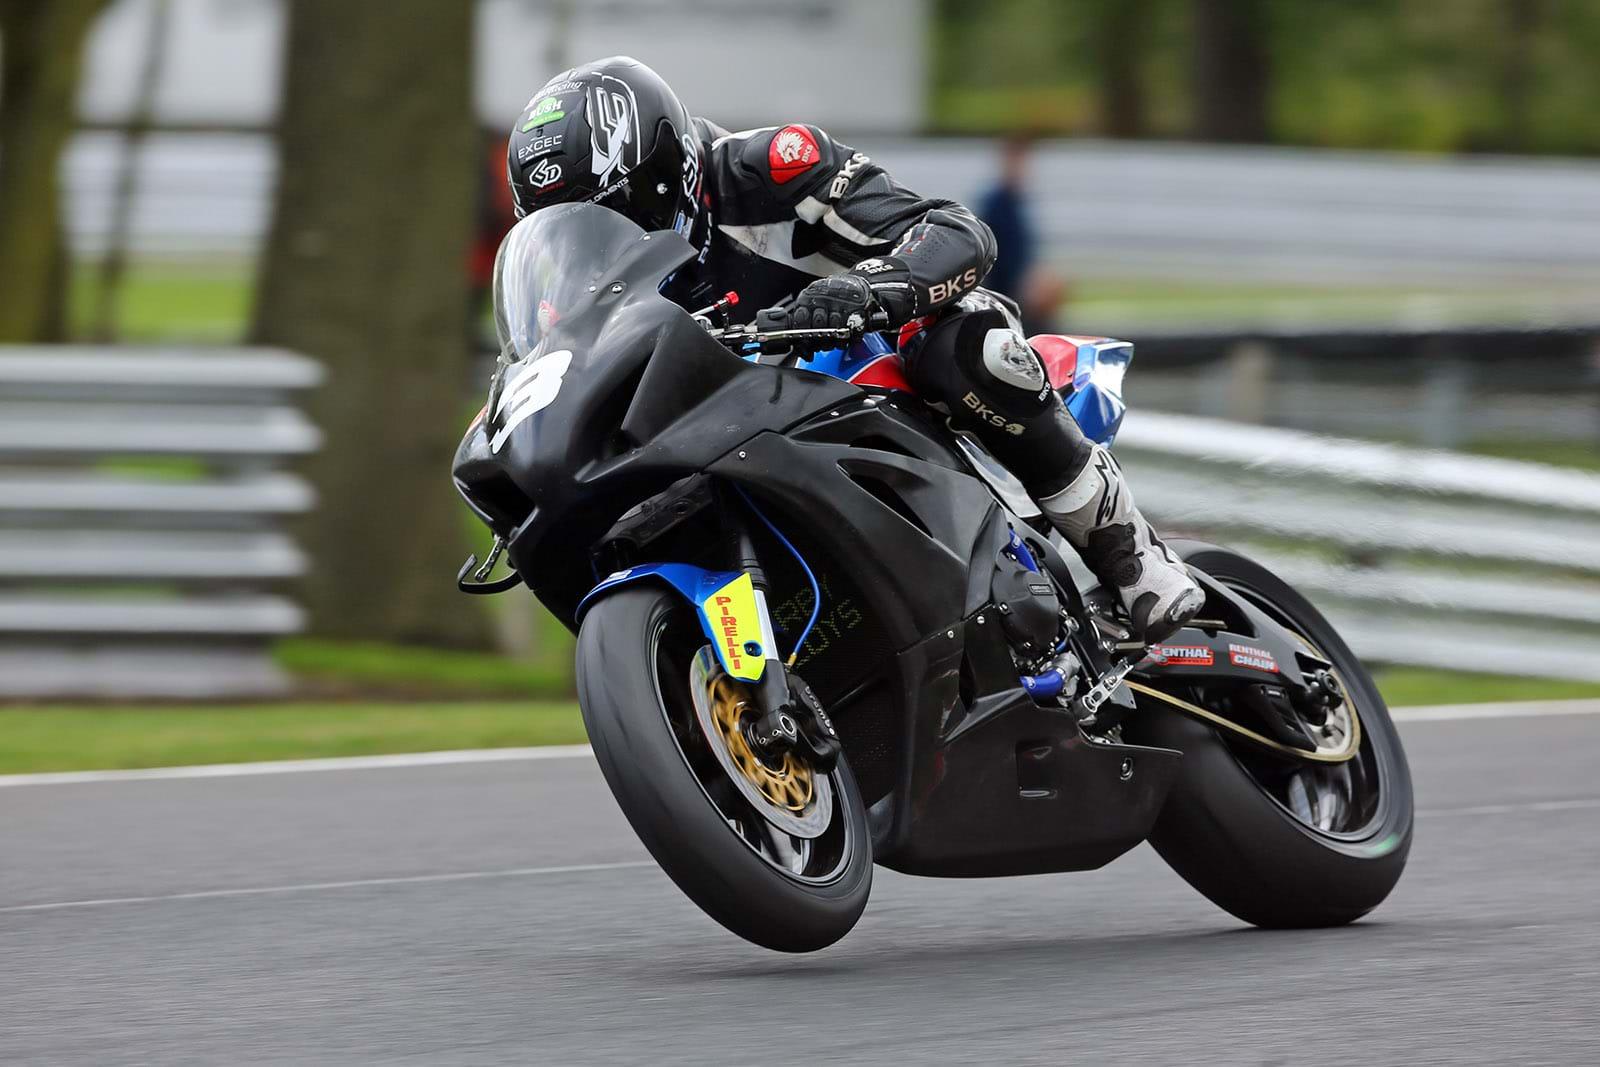 Billy McConnell on his Suzuki GSX-R1000 sport motorcycle